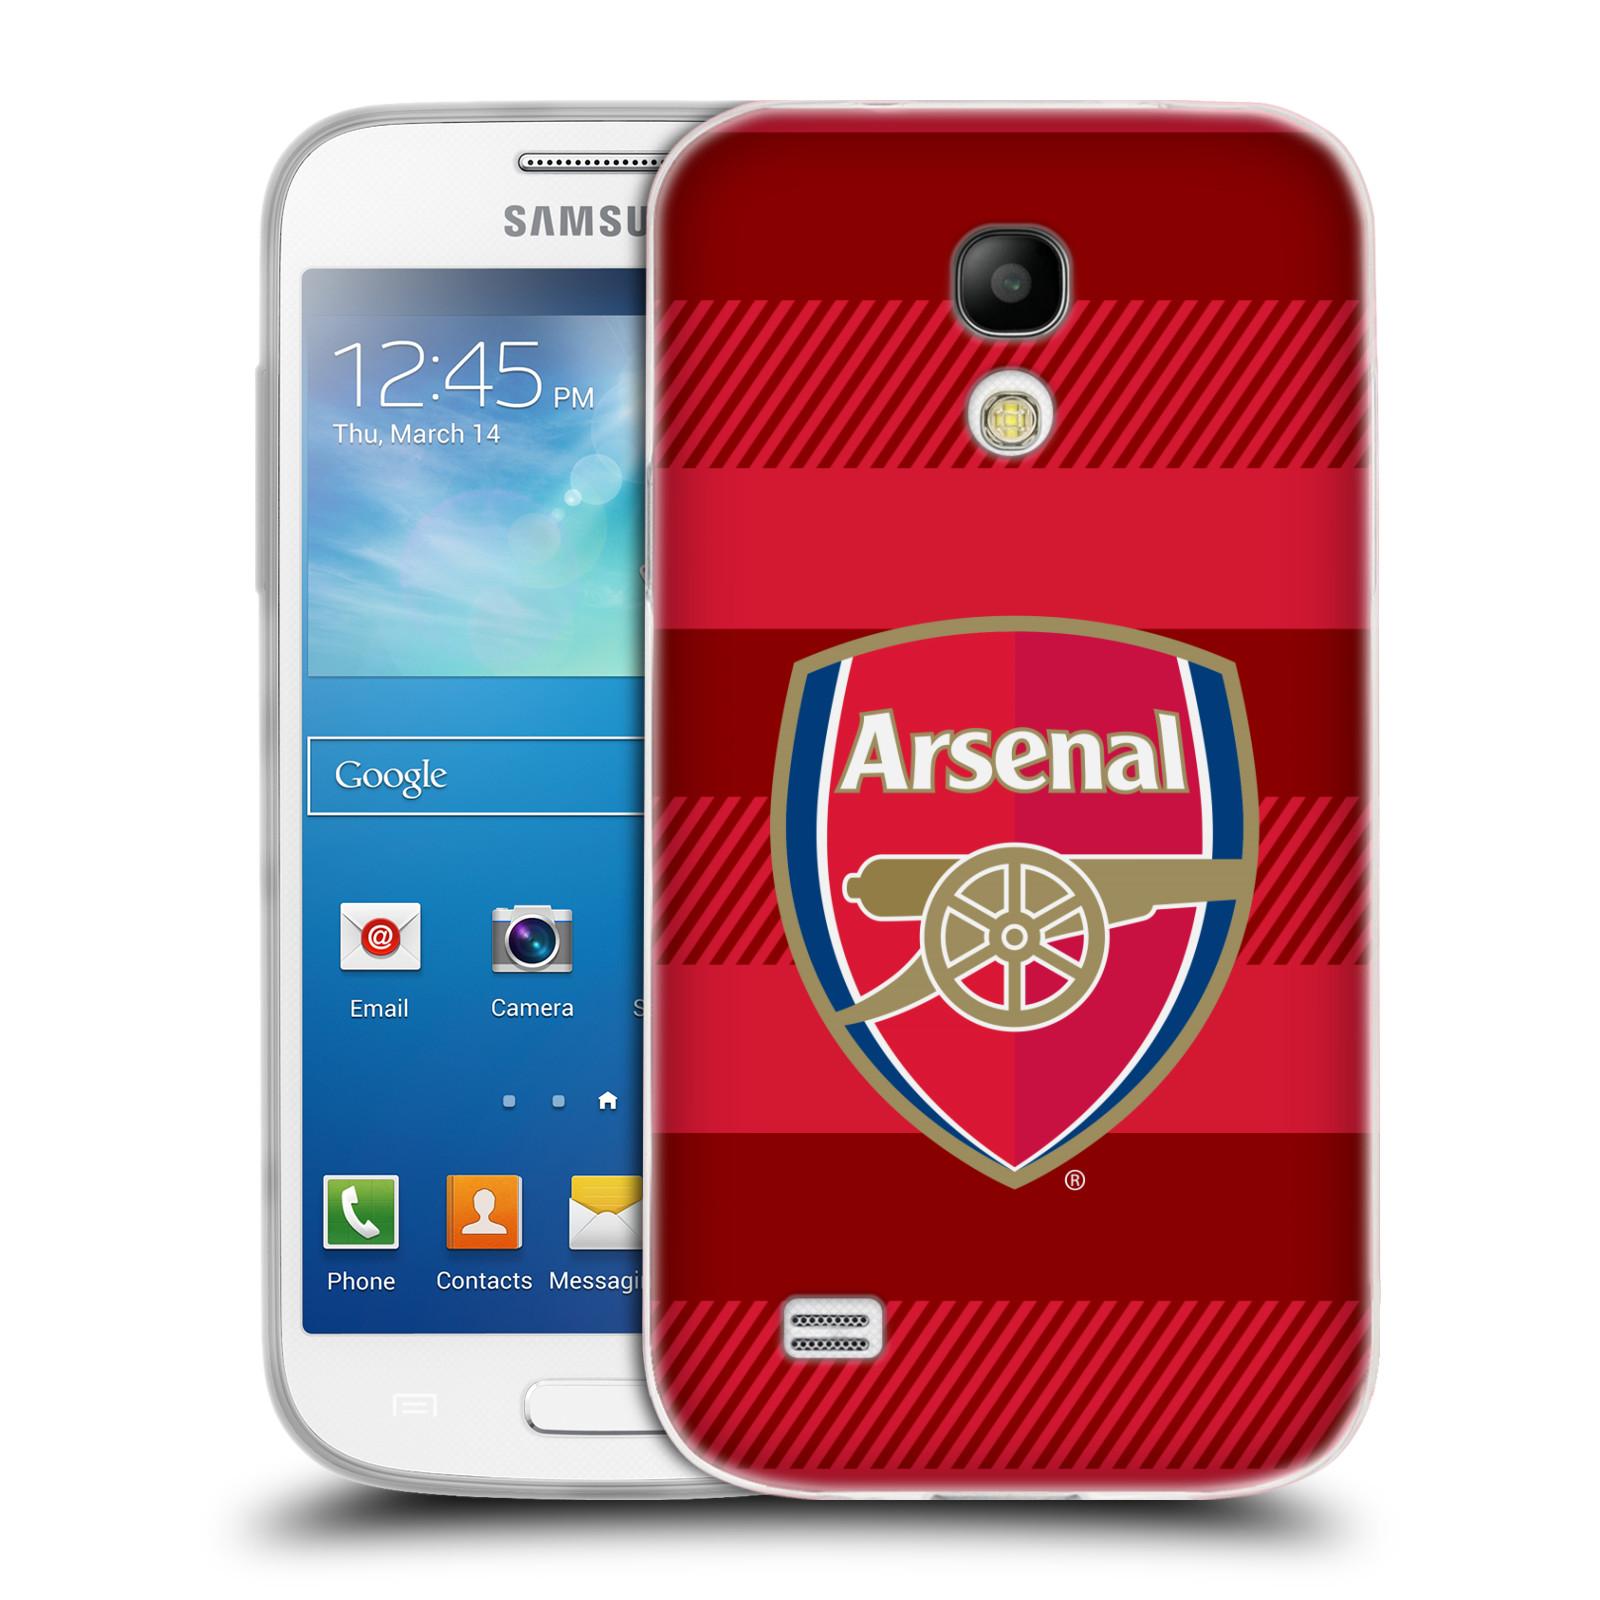 Silikonové pouzdro na mobil Samsung Galaxy S4 Mini - Head Case - Arsenal FC - Logo s pruhy